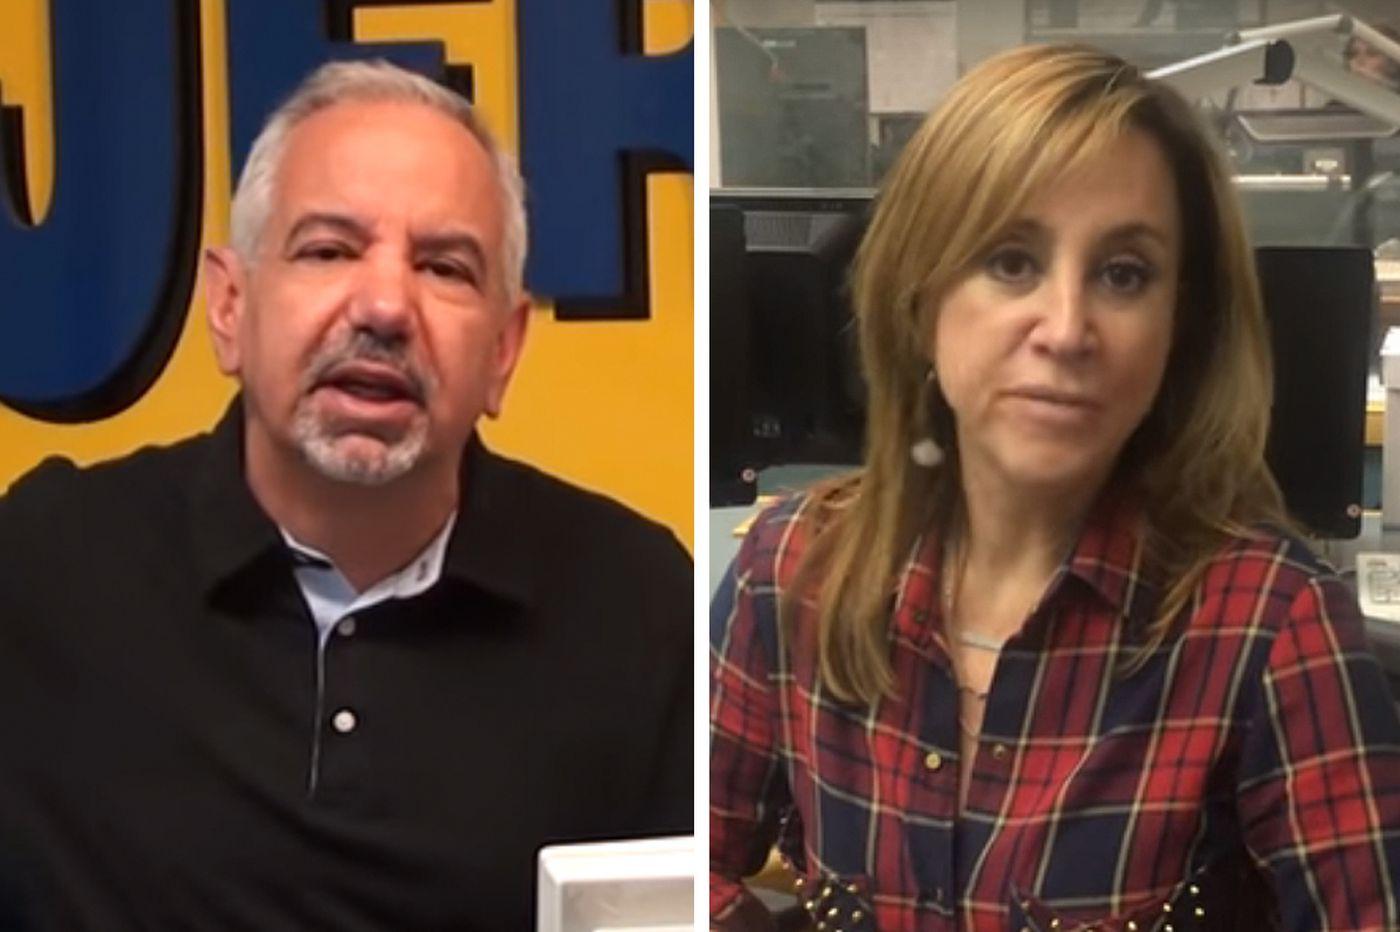 NJ 101.5 suspends 'Dennis & Judi' hosts for racist comments about N.J. attorney general